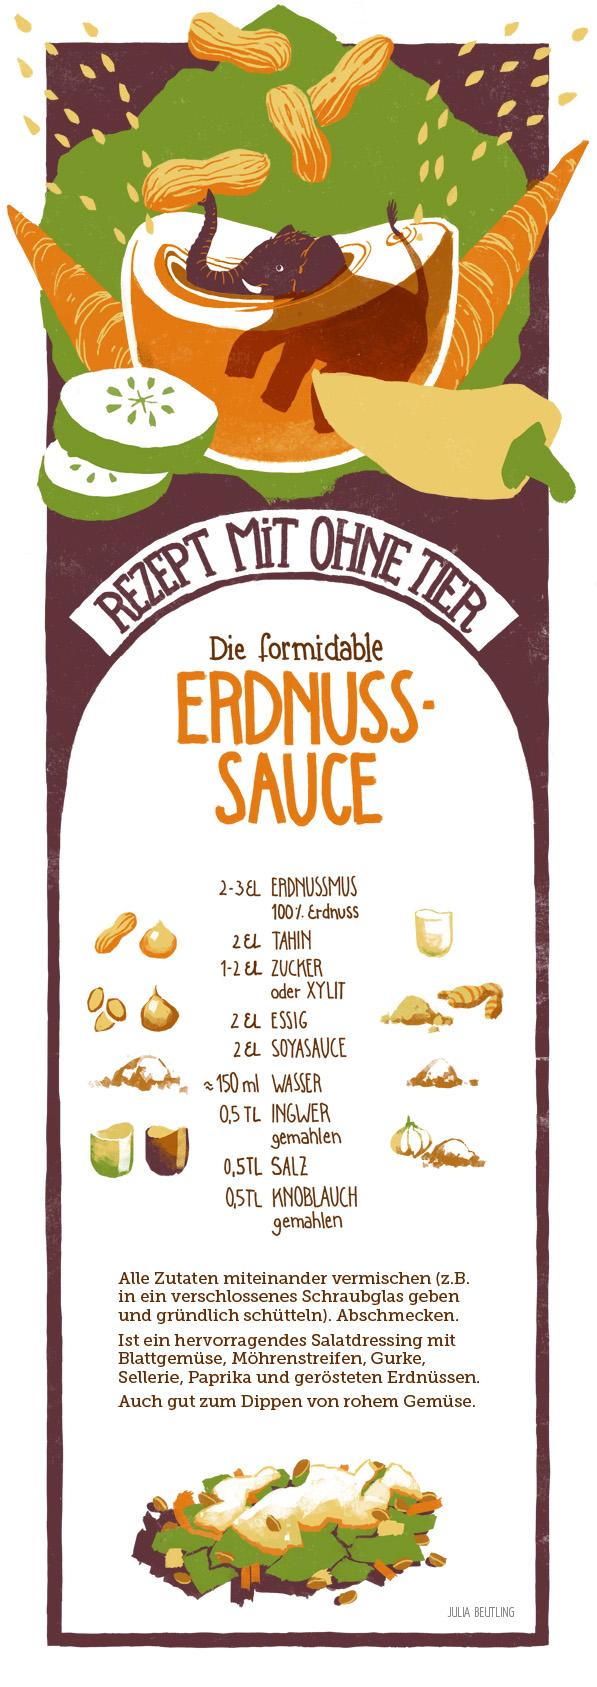 WEB rezept 2 DE erdnusssauce